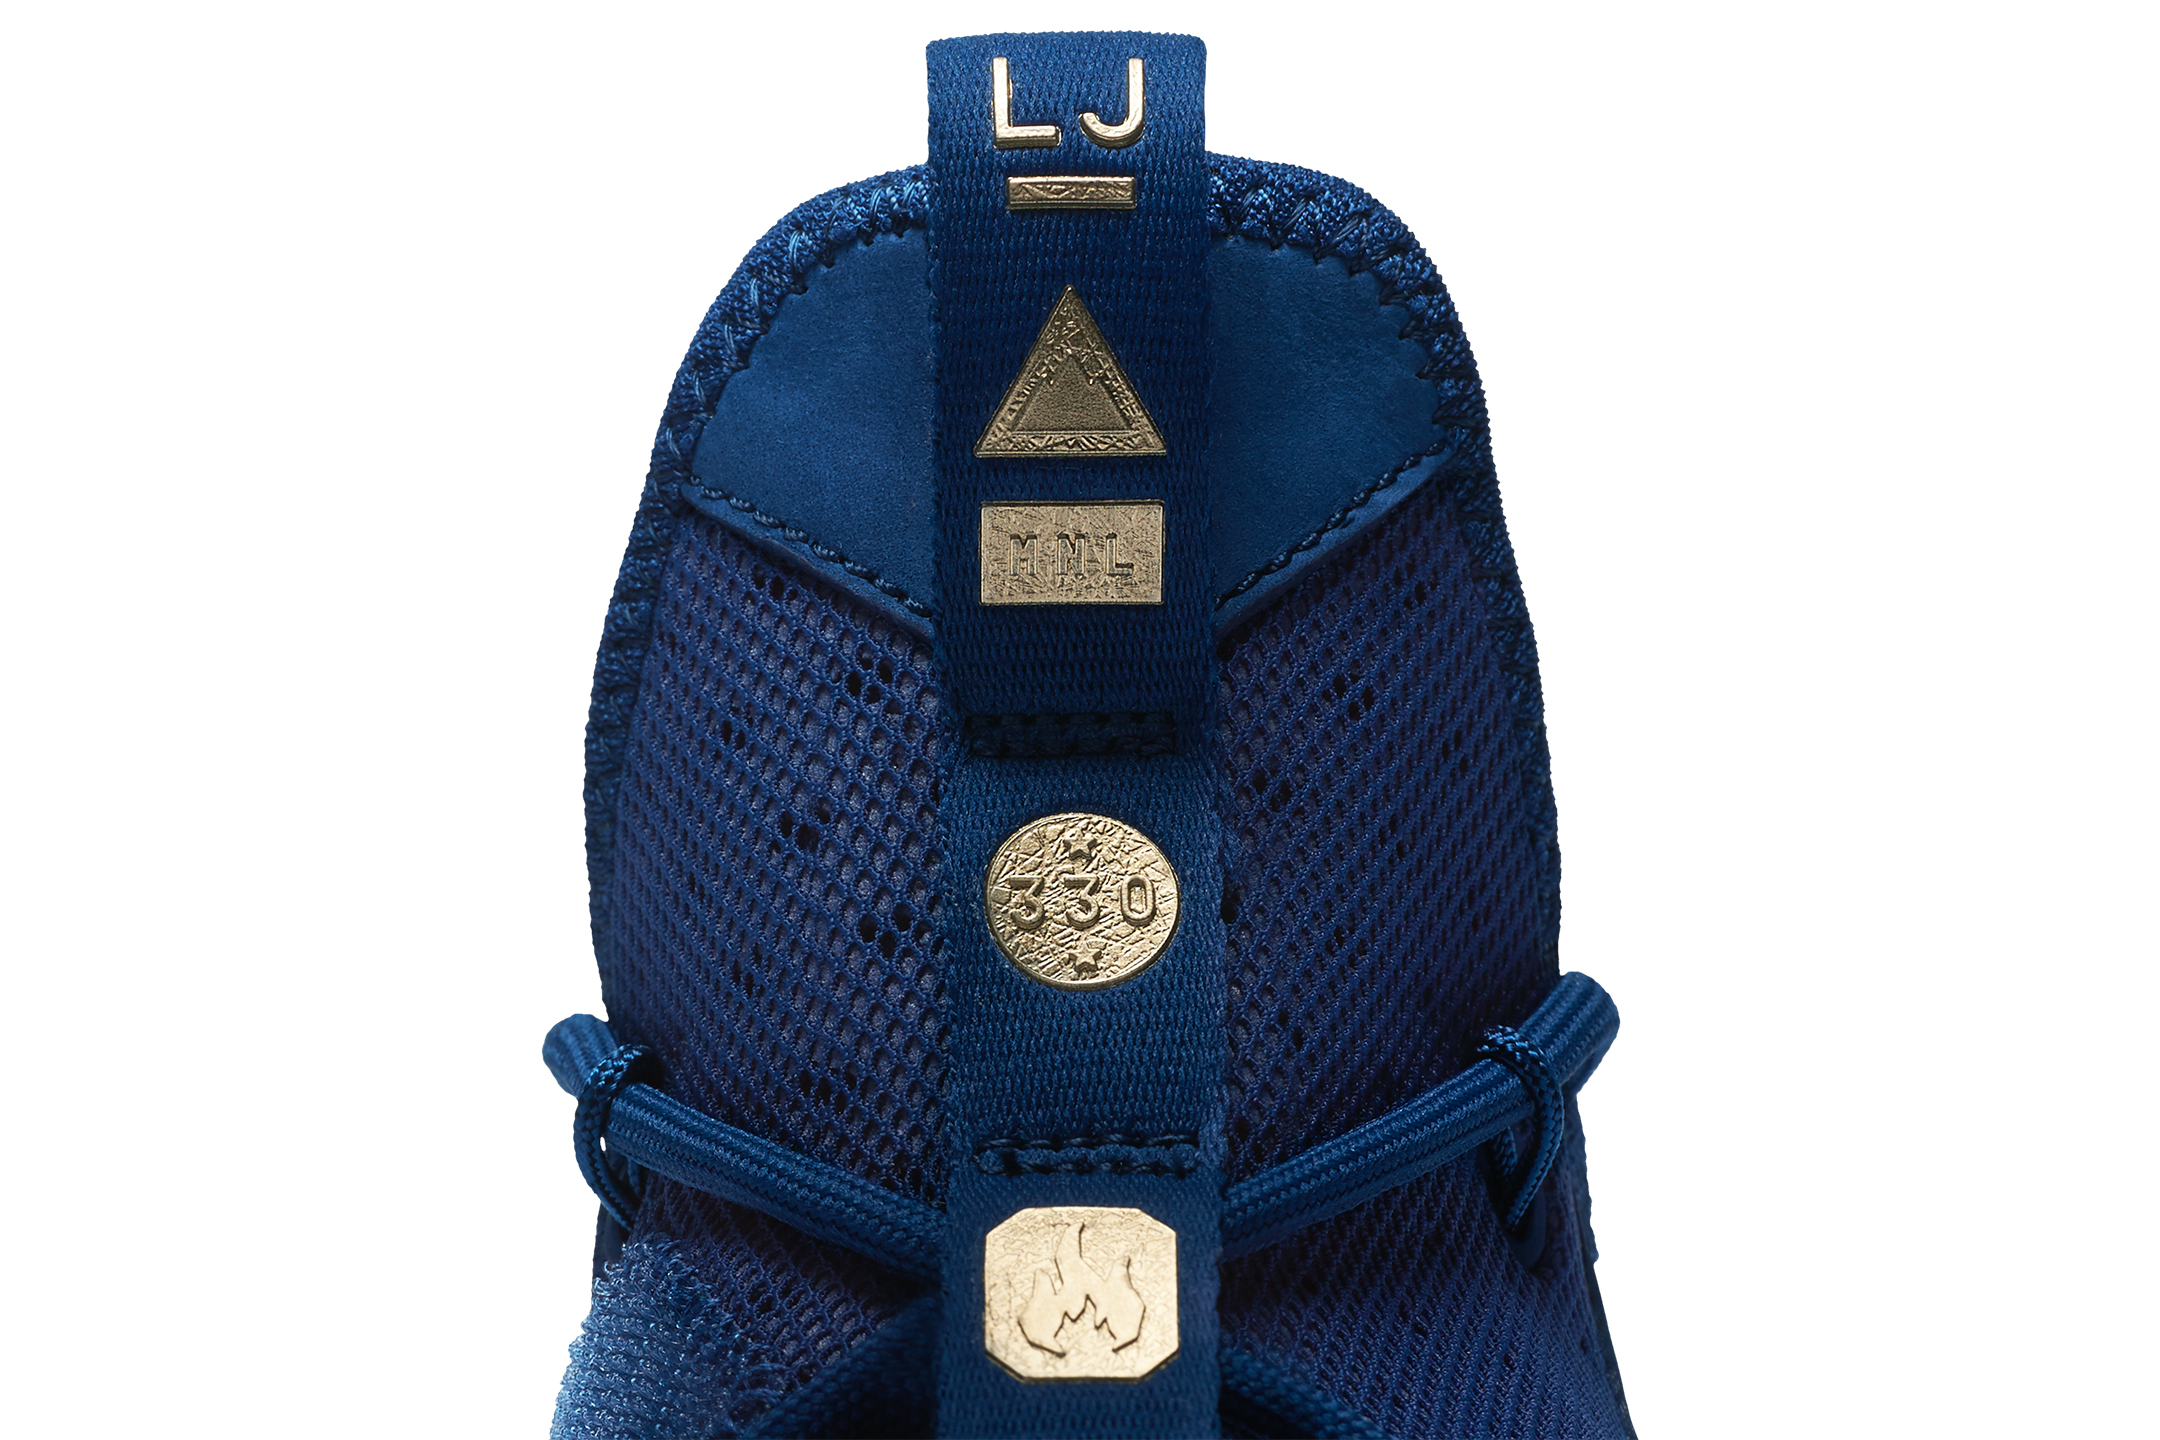 da80221440023 Nike releases PH-inspired shoe dubbed  Agimat